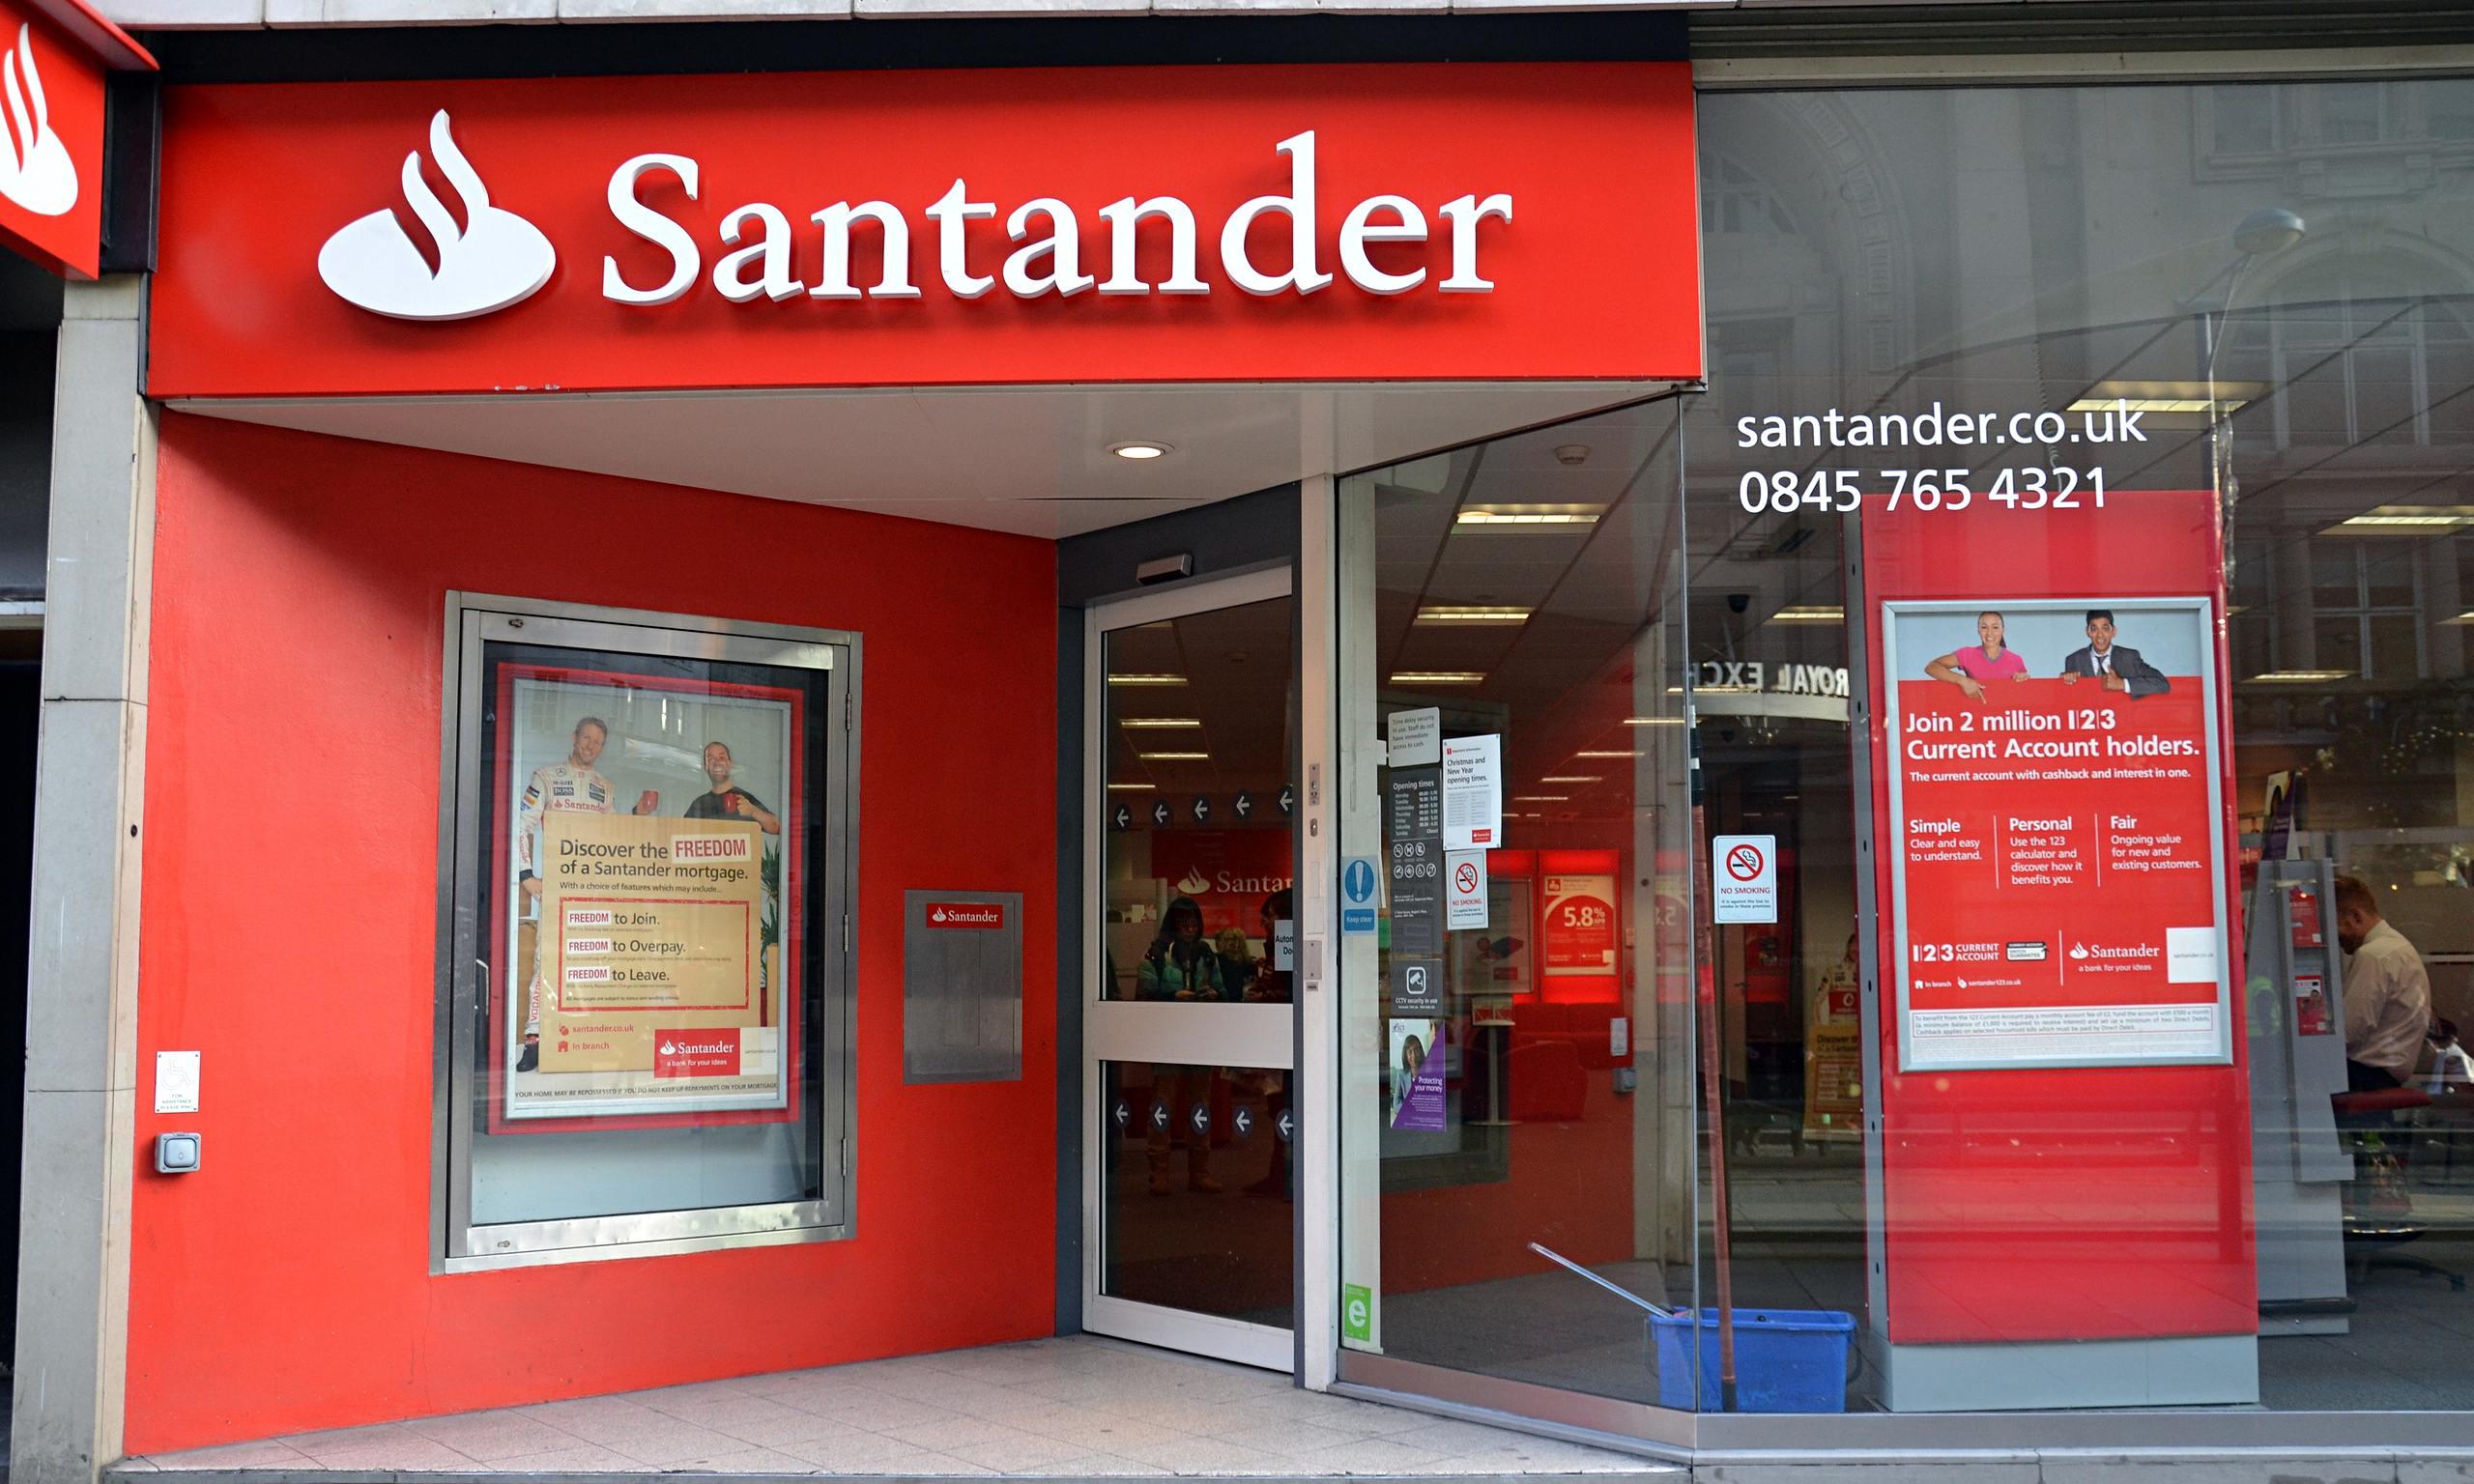 is santander a uk bank